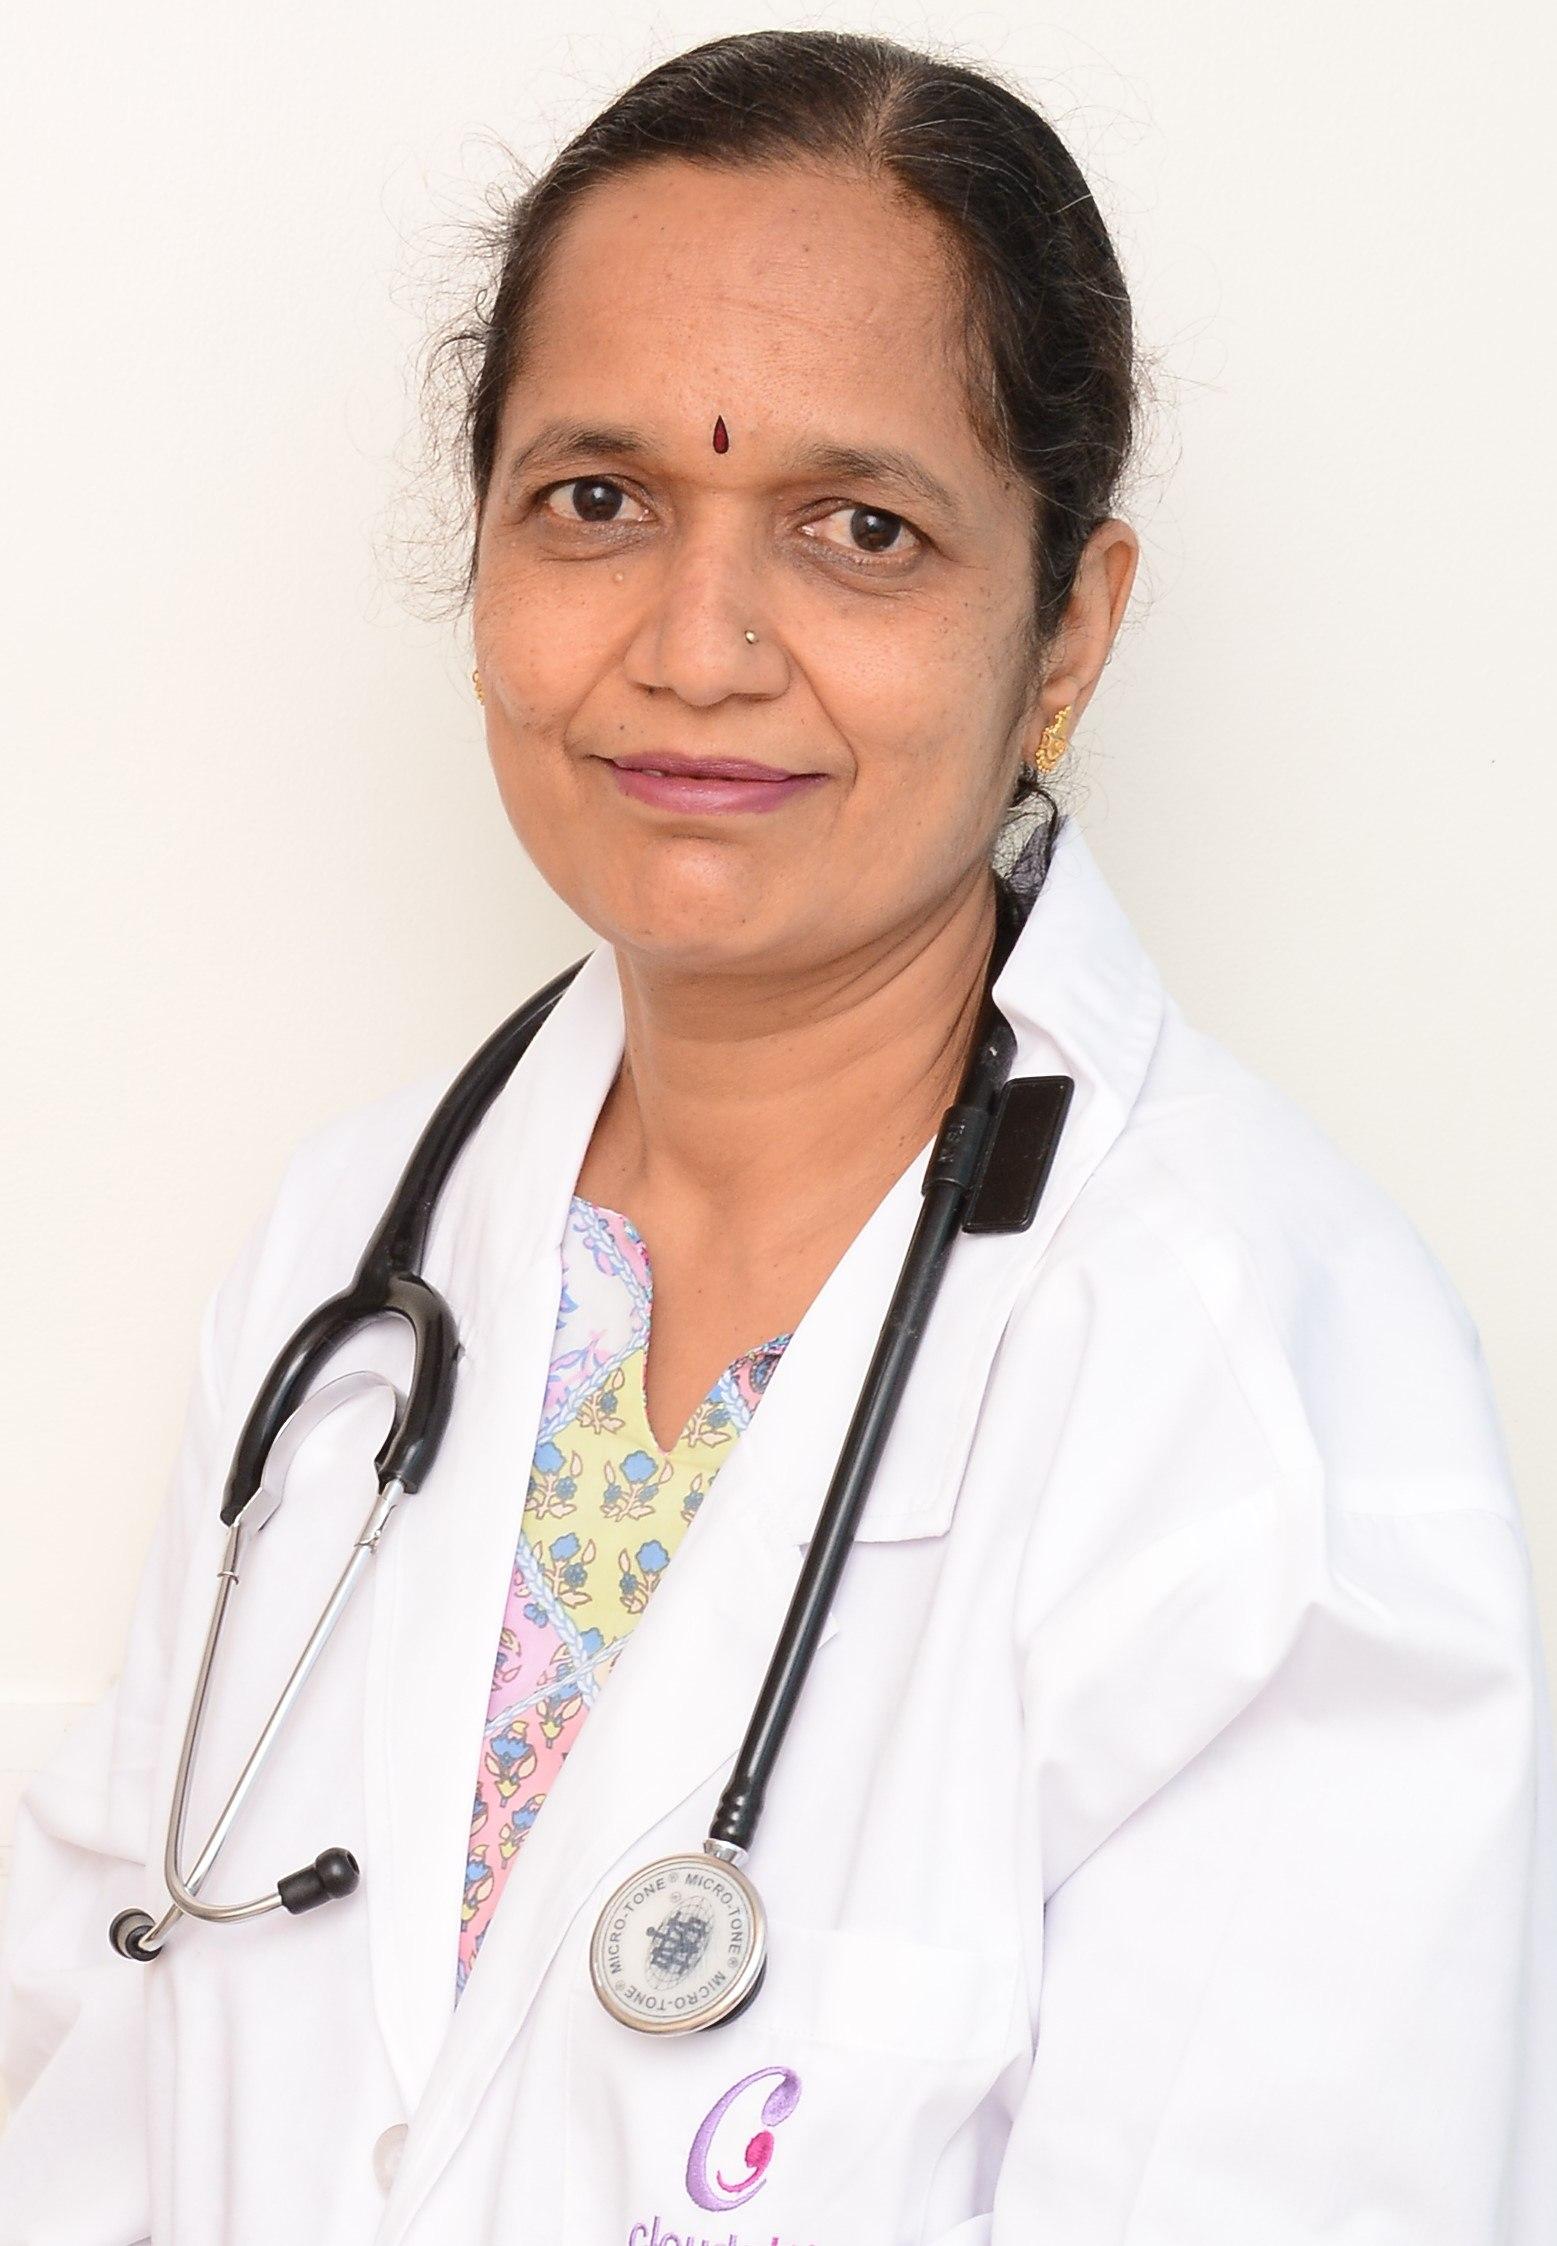 Dr. Poornima Murthy